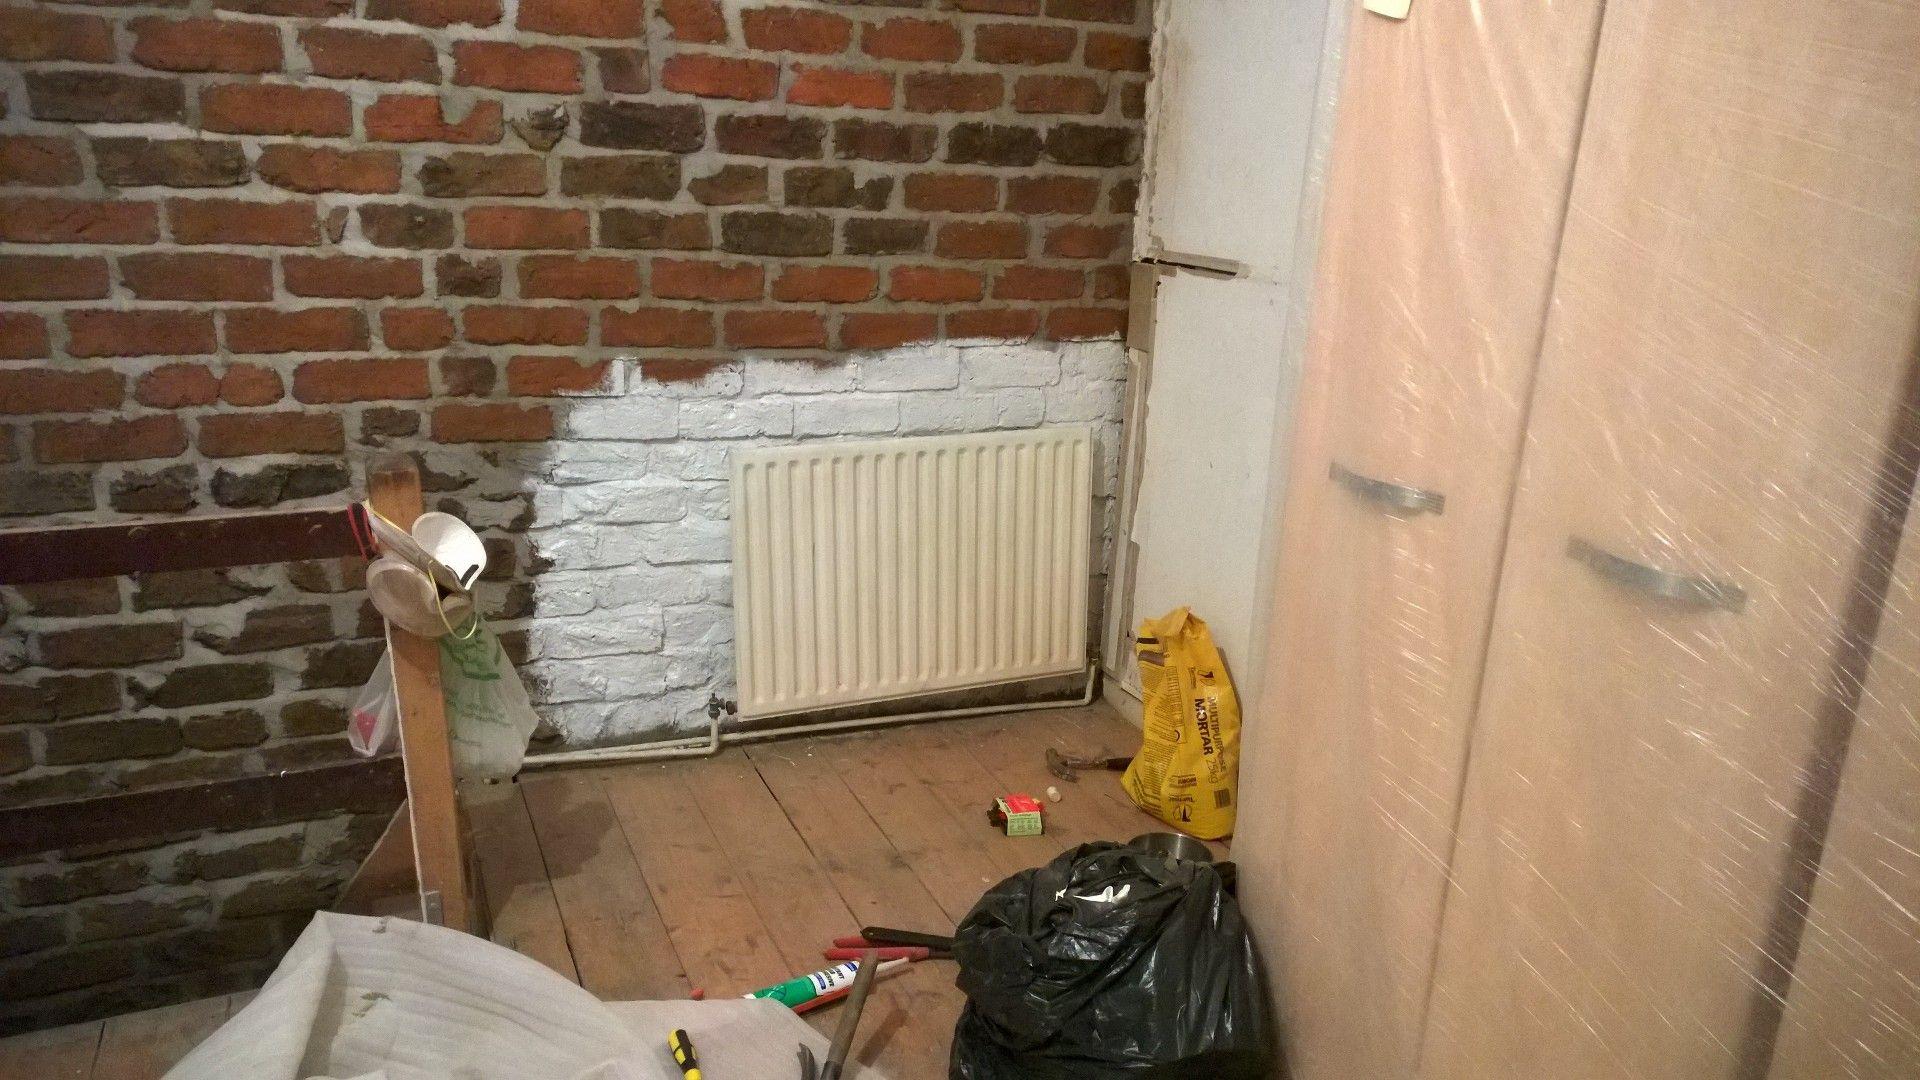 4 radiator back on leaking filled wonky not down